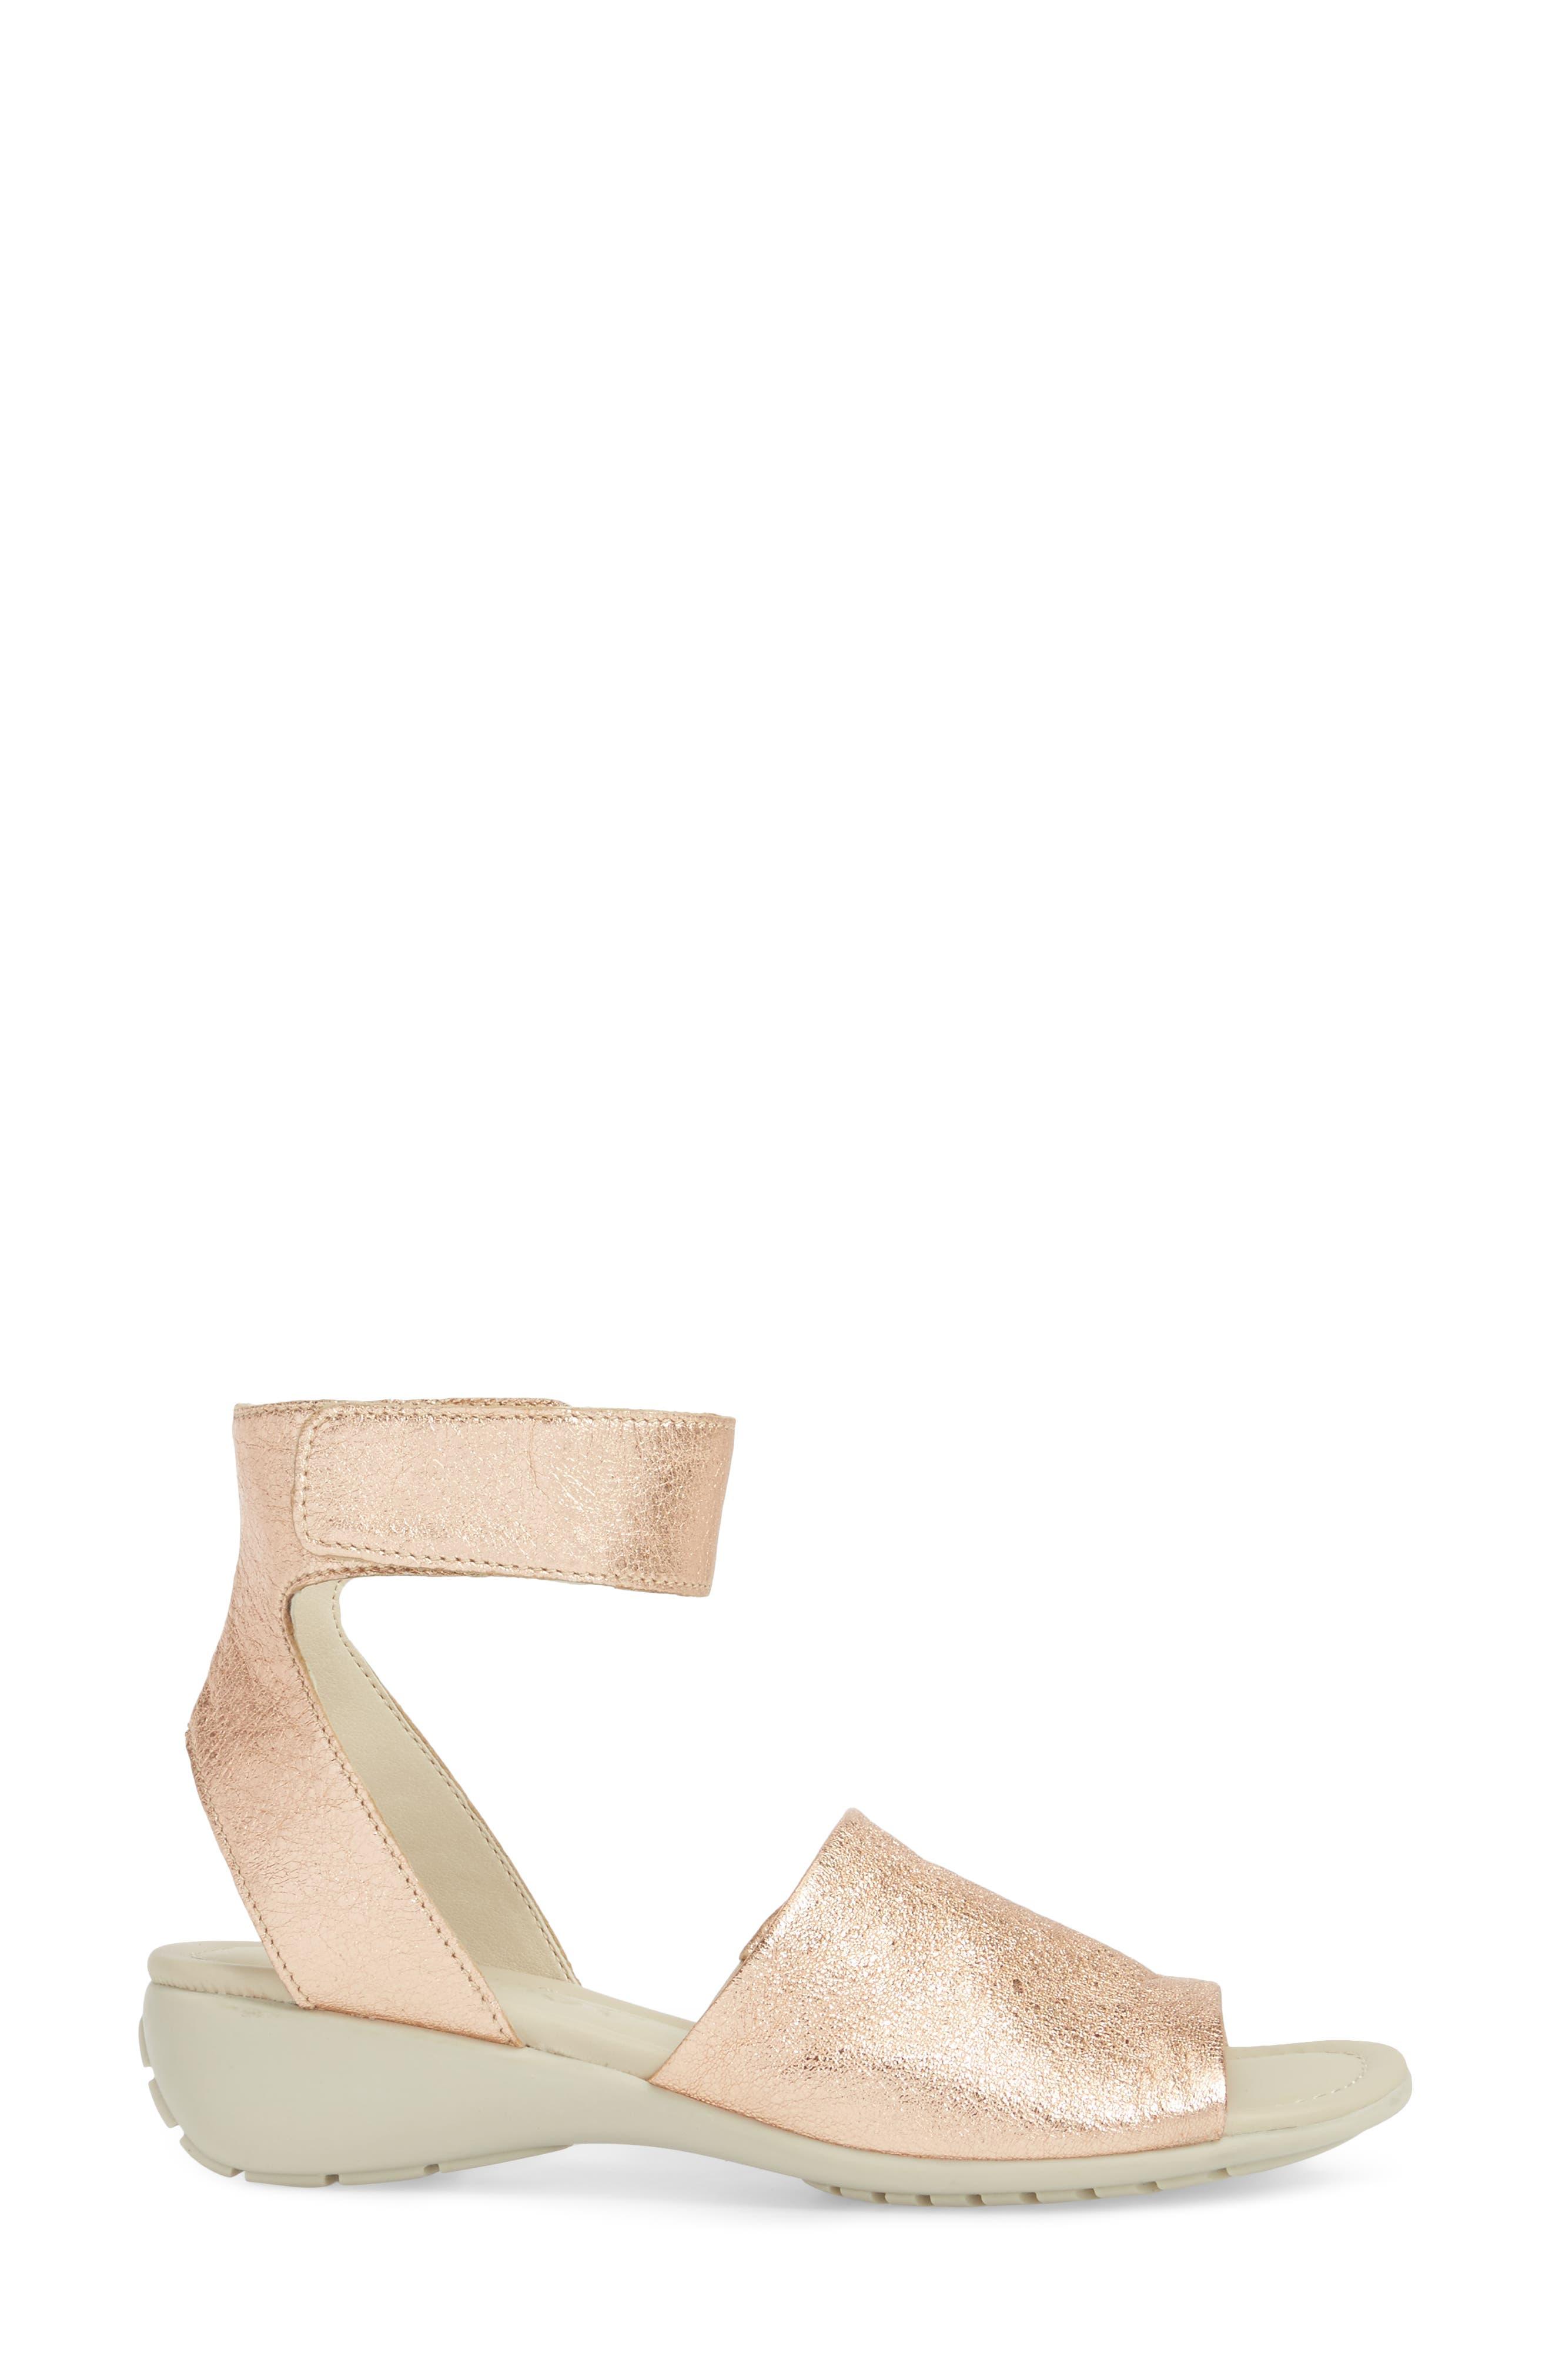 'Beglad' Leather Ankle Strap Sandal,                             Alternate thumbnail 36, color,